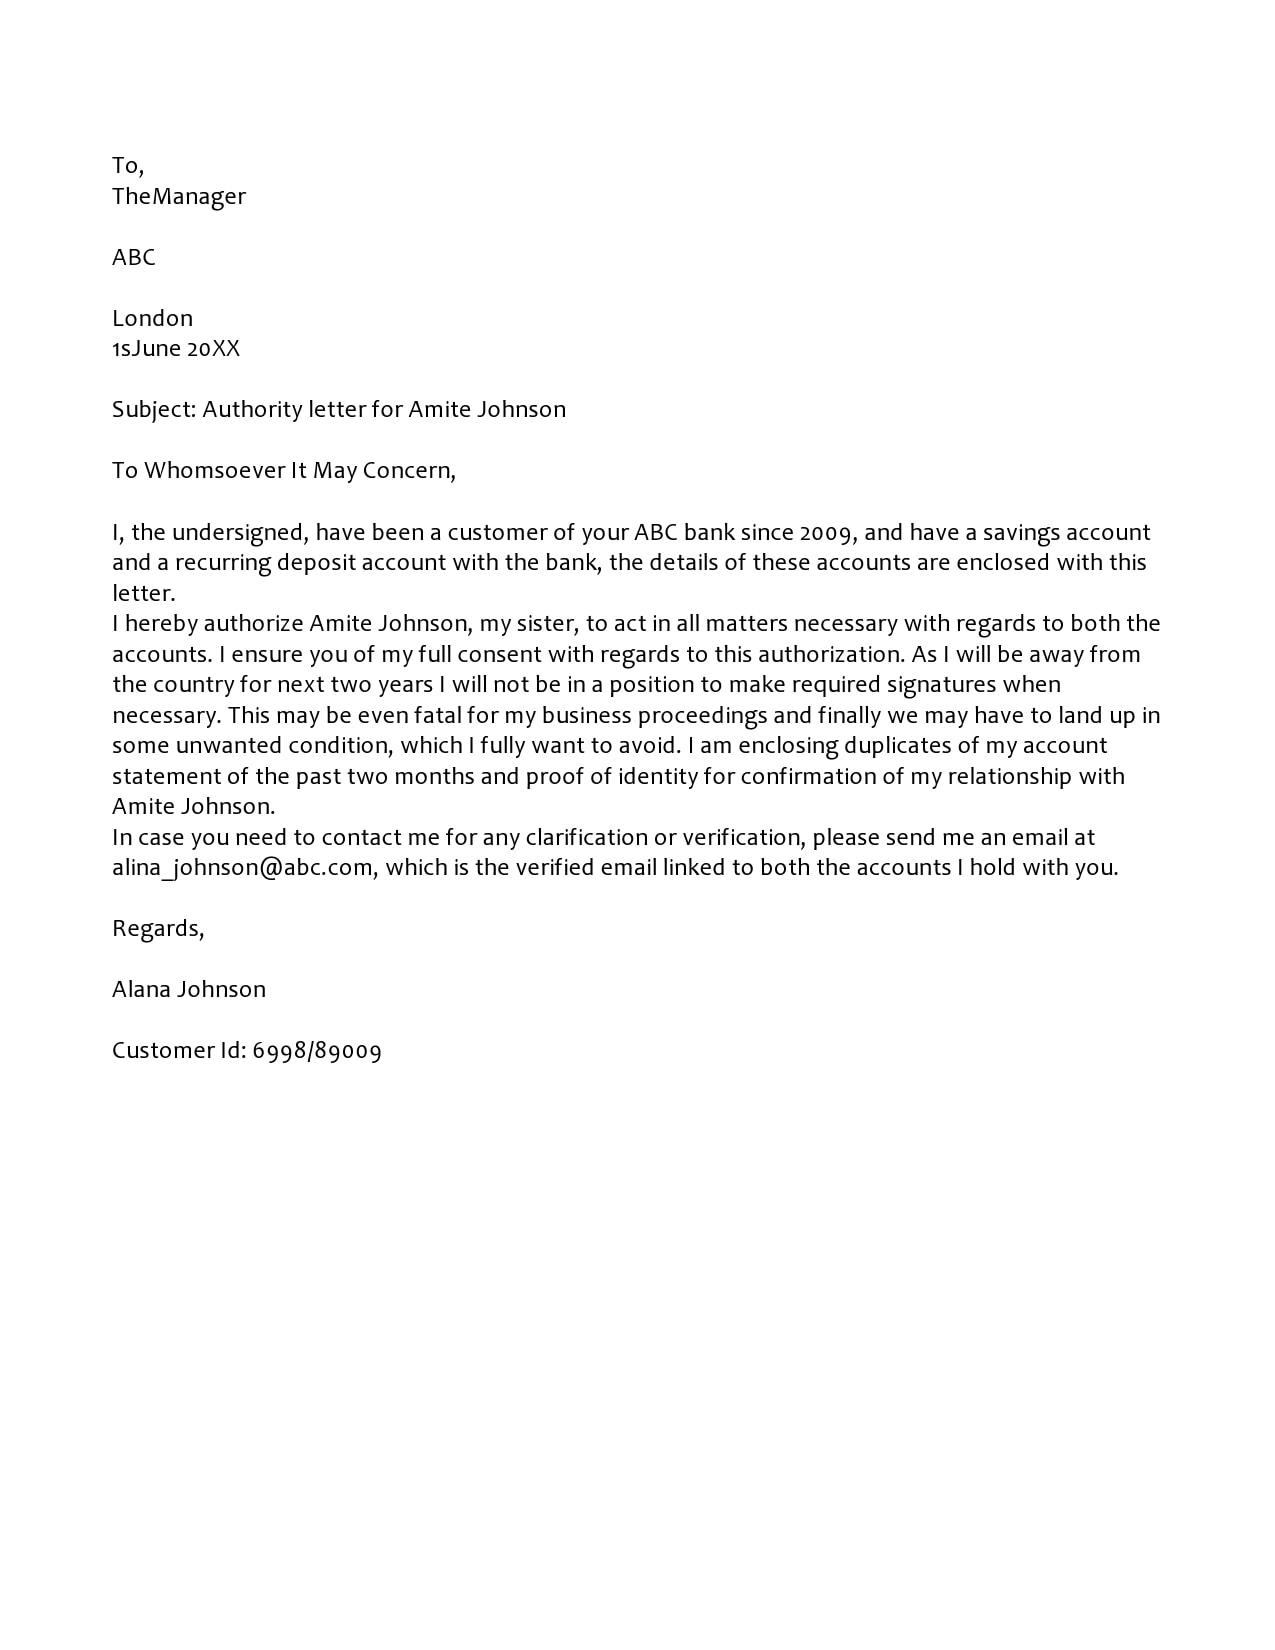 authorization letter 08